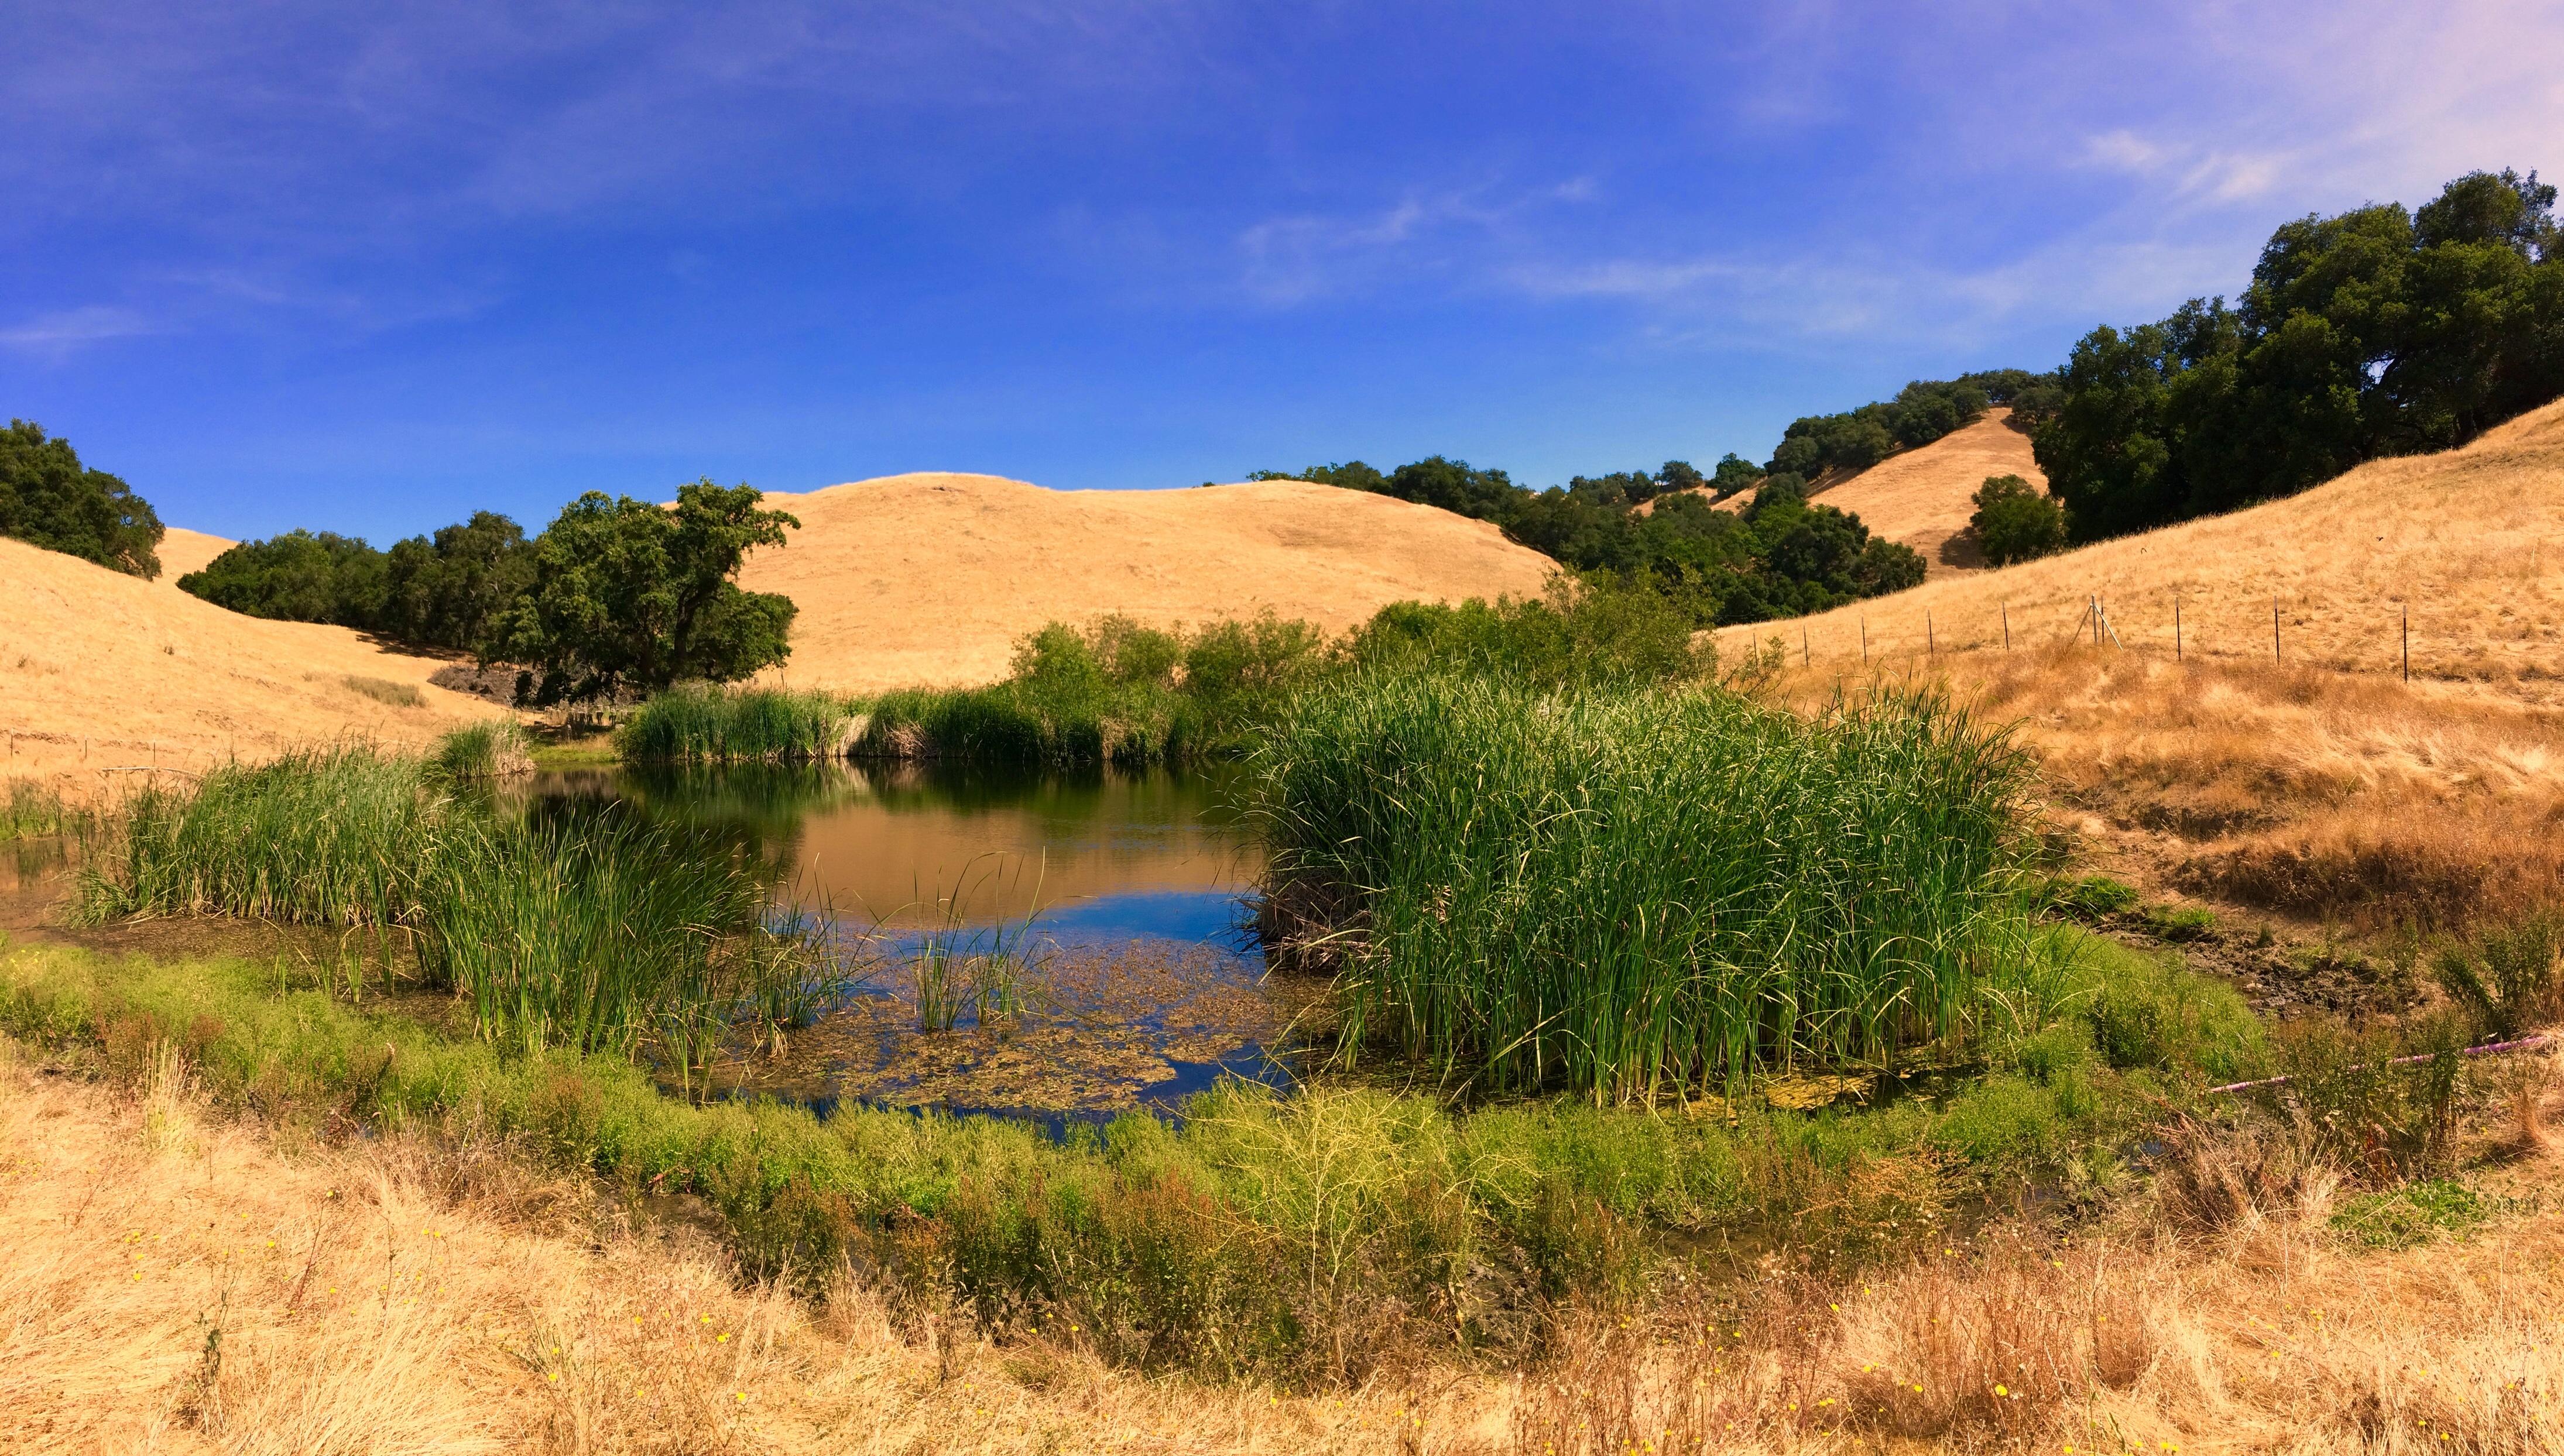 Diablo Foothills - Landscape - D.Mauk - May-10-2018